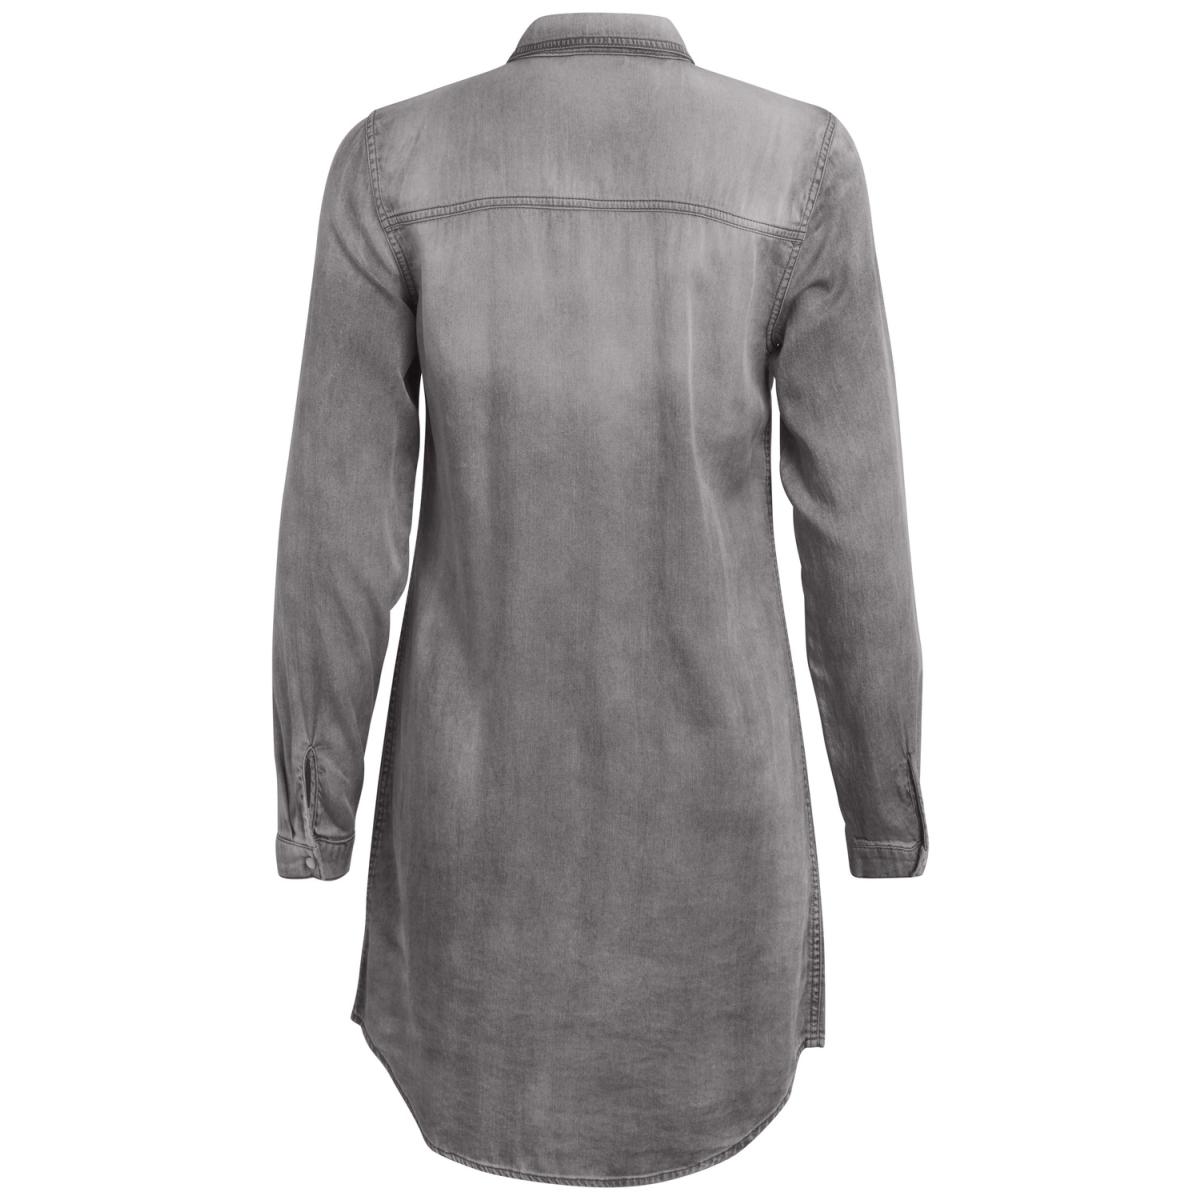 vibista denim dress-fav 14043658 vila blouse grey denim